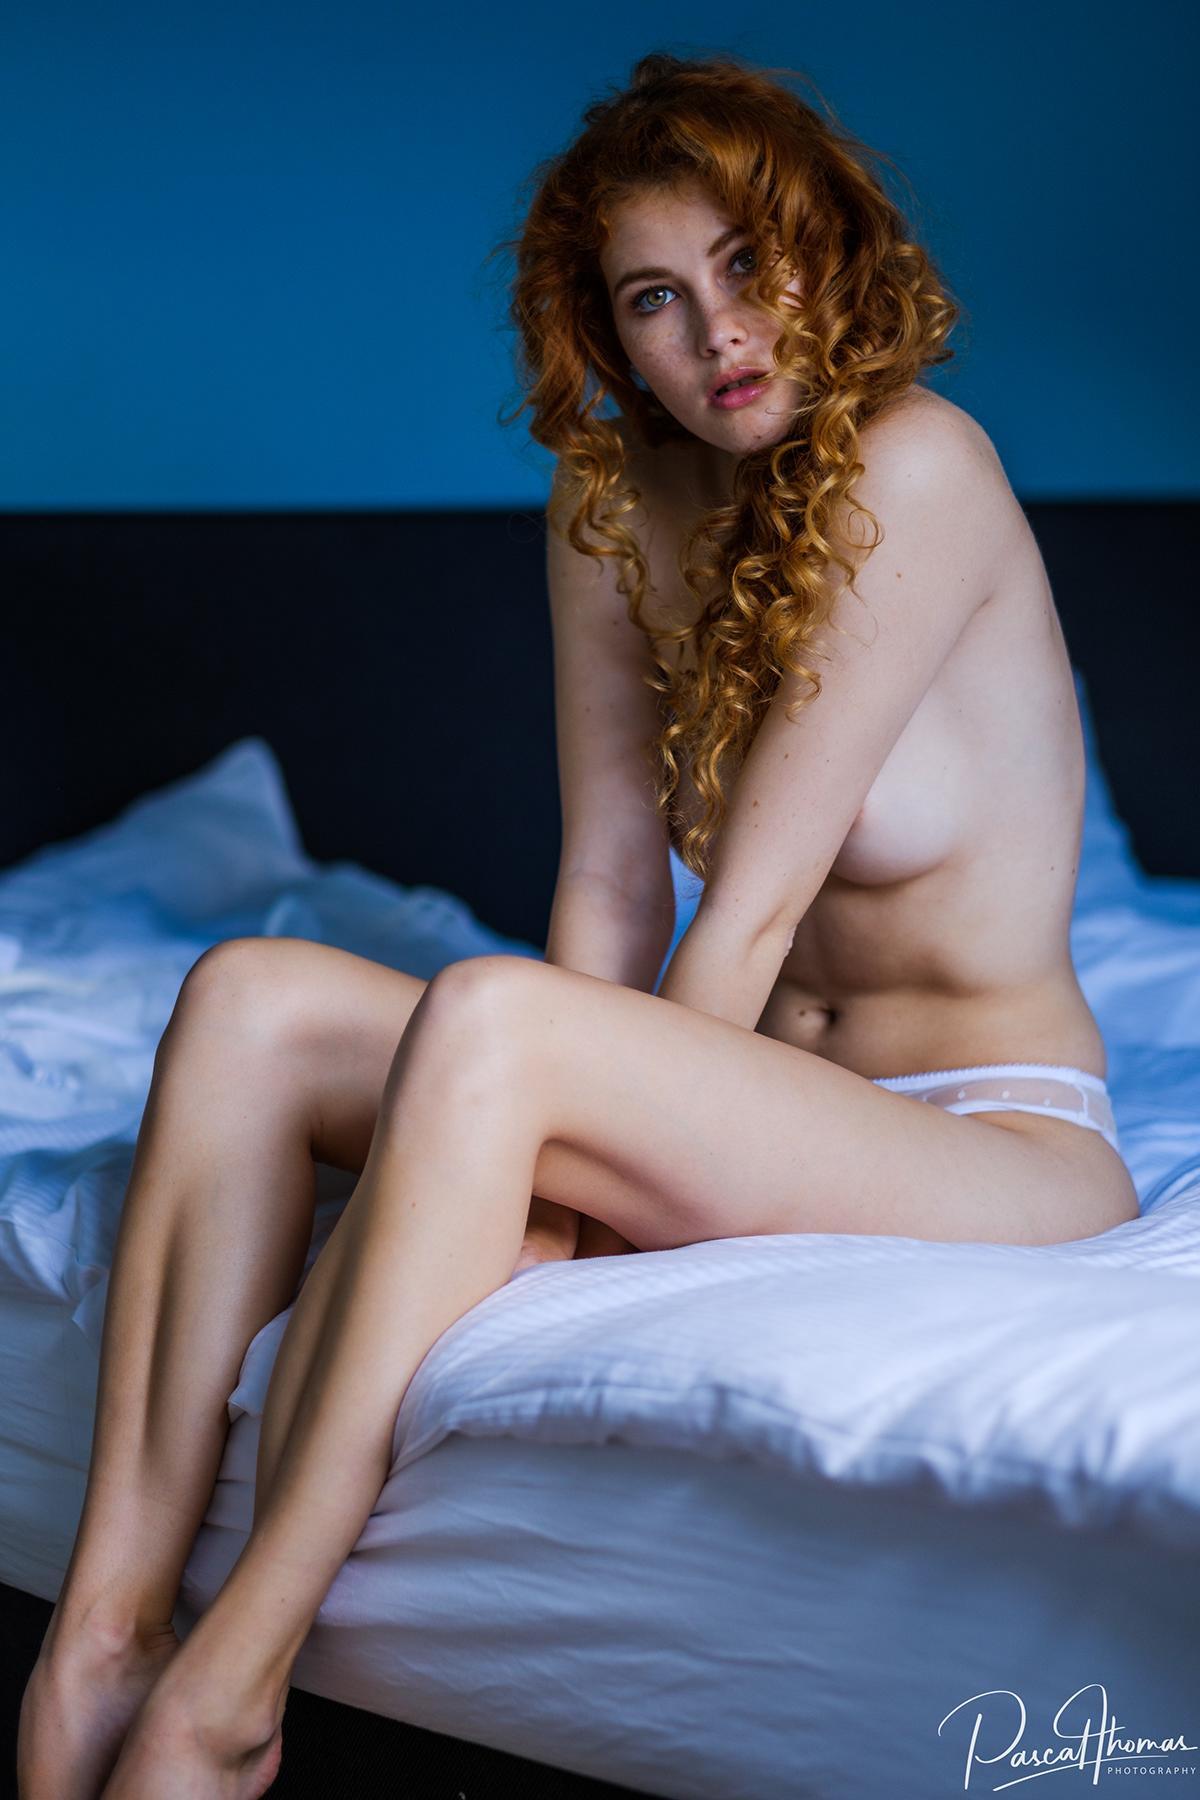 Heidi Romanova - Pascal Thomas photoshoot